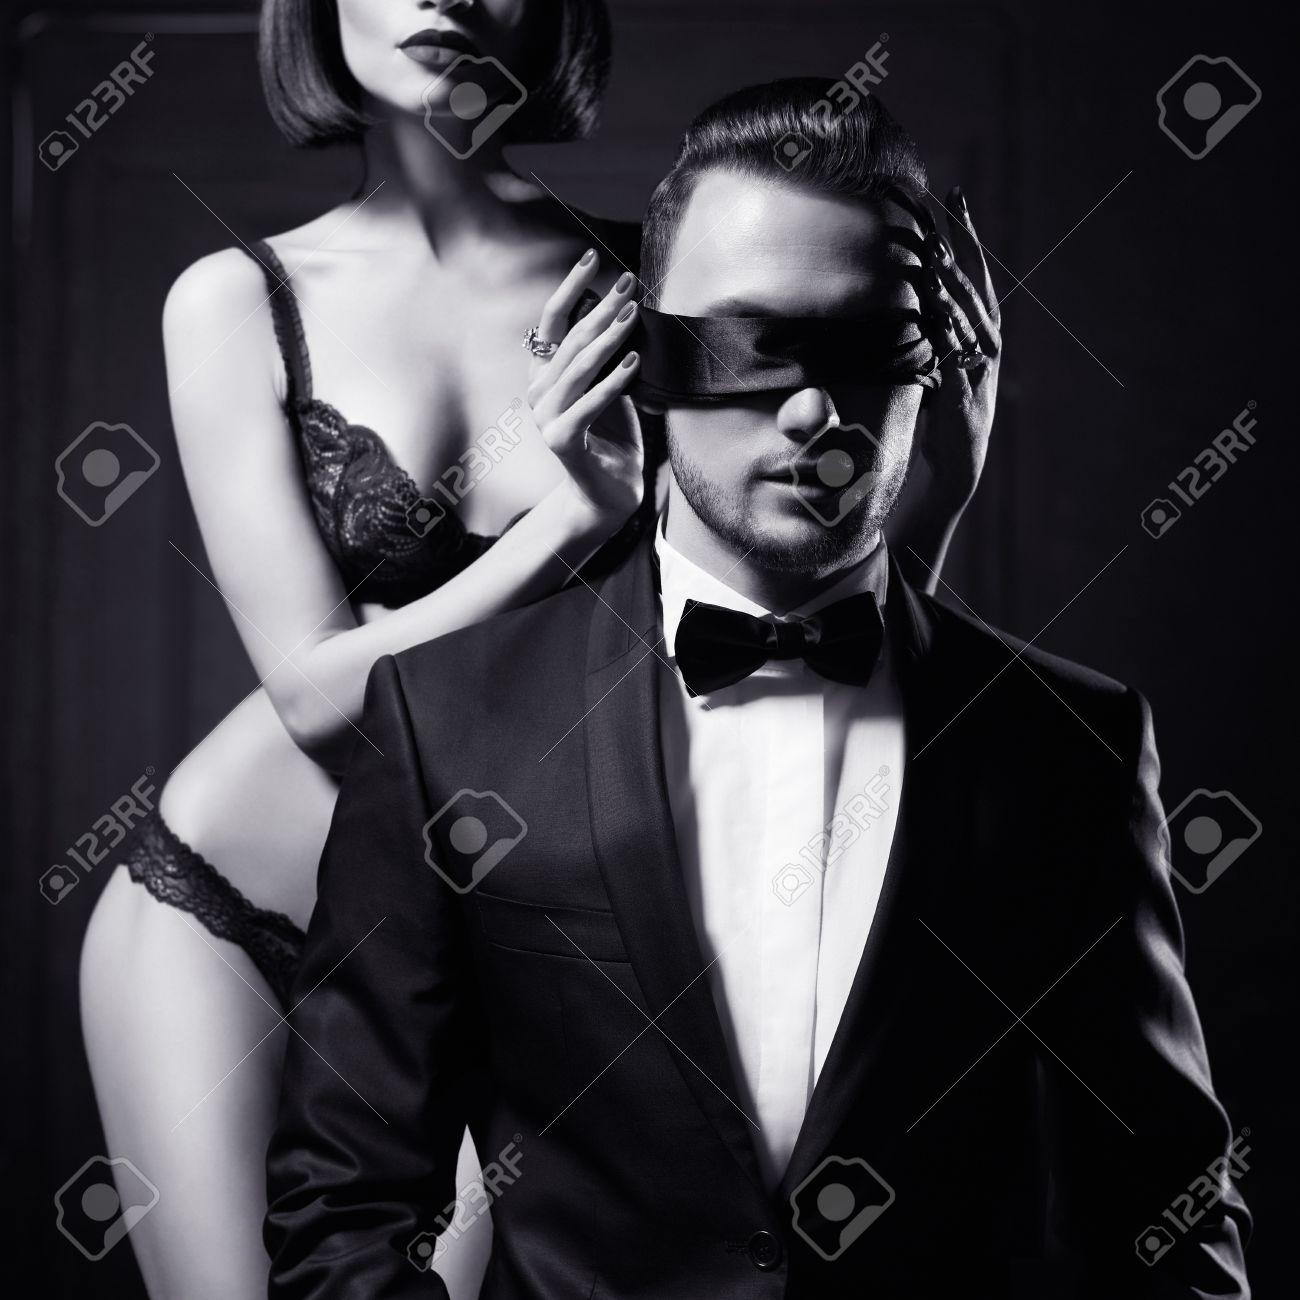 Fashion studio photo of a sensual couple in lingerie and a tuxedo Standard-Bild - 40322499